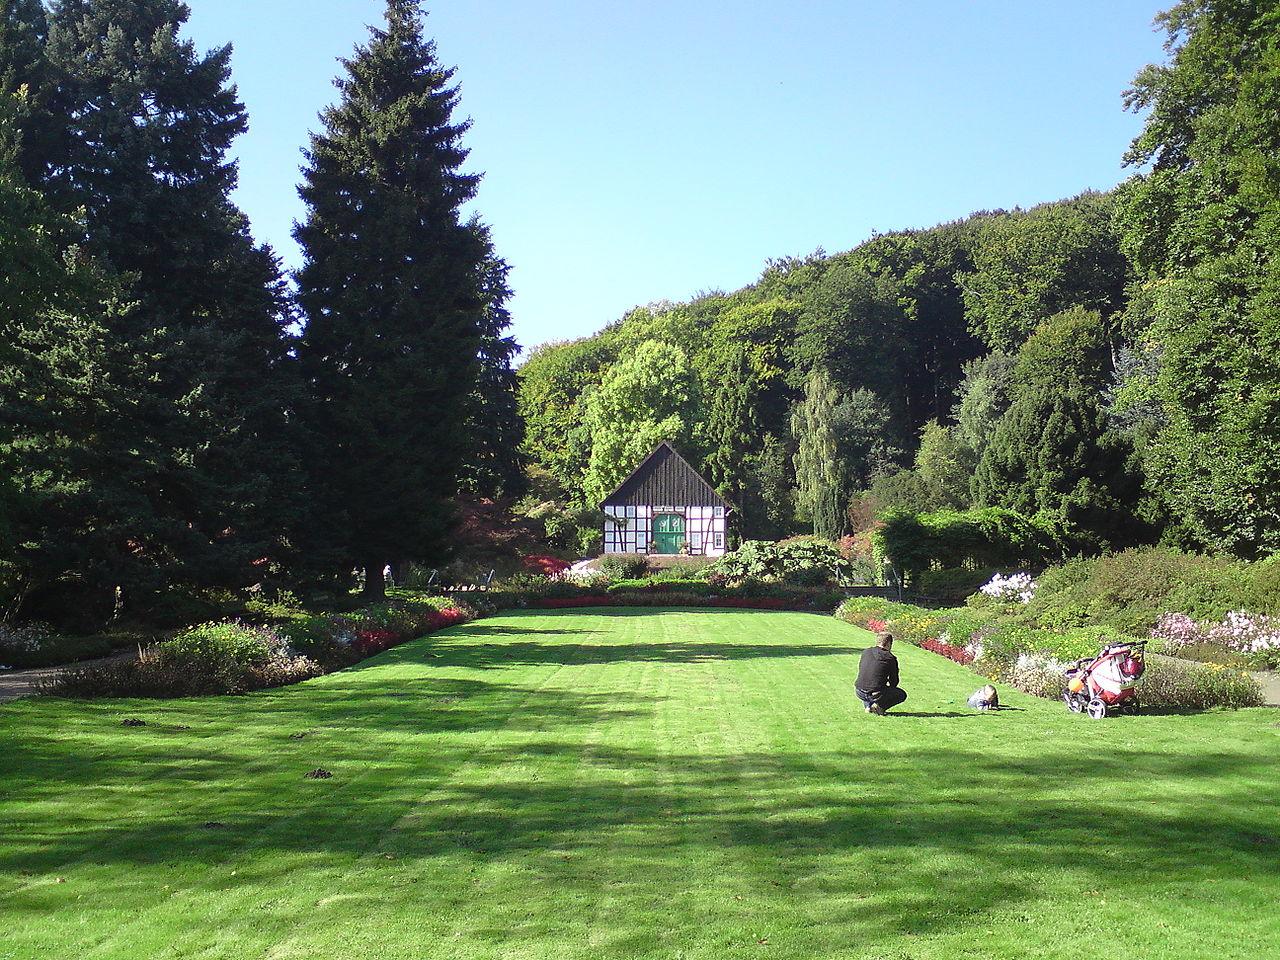 Bild Botanischer Garten Bielefeld